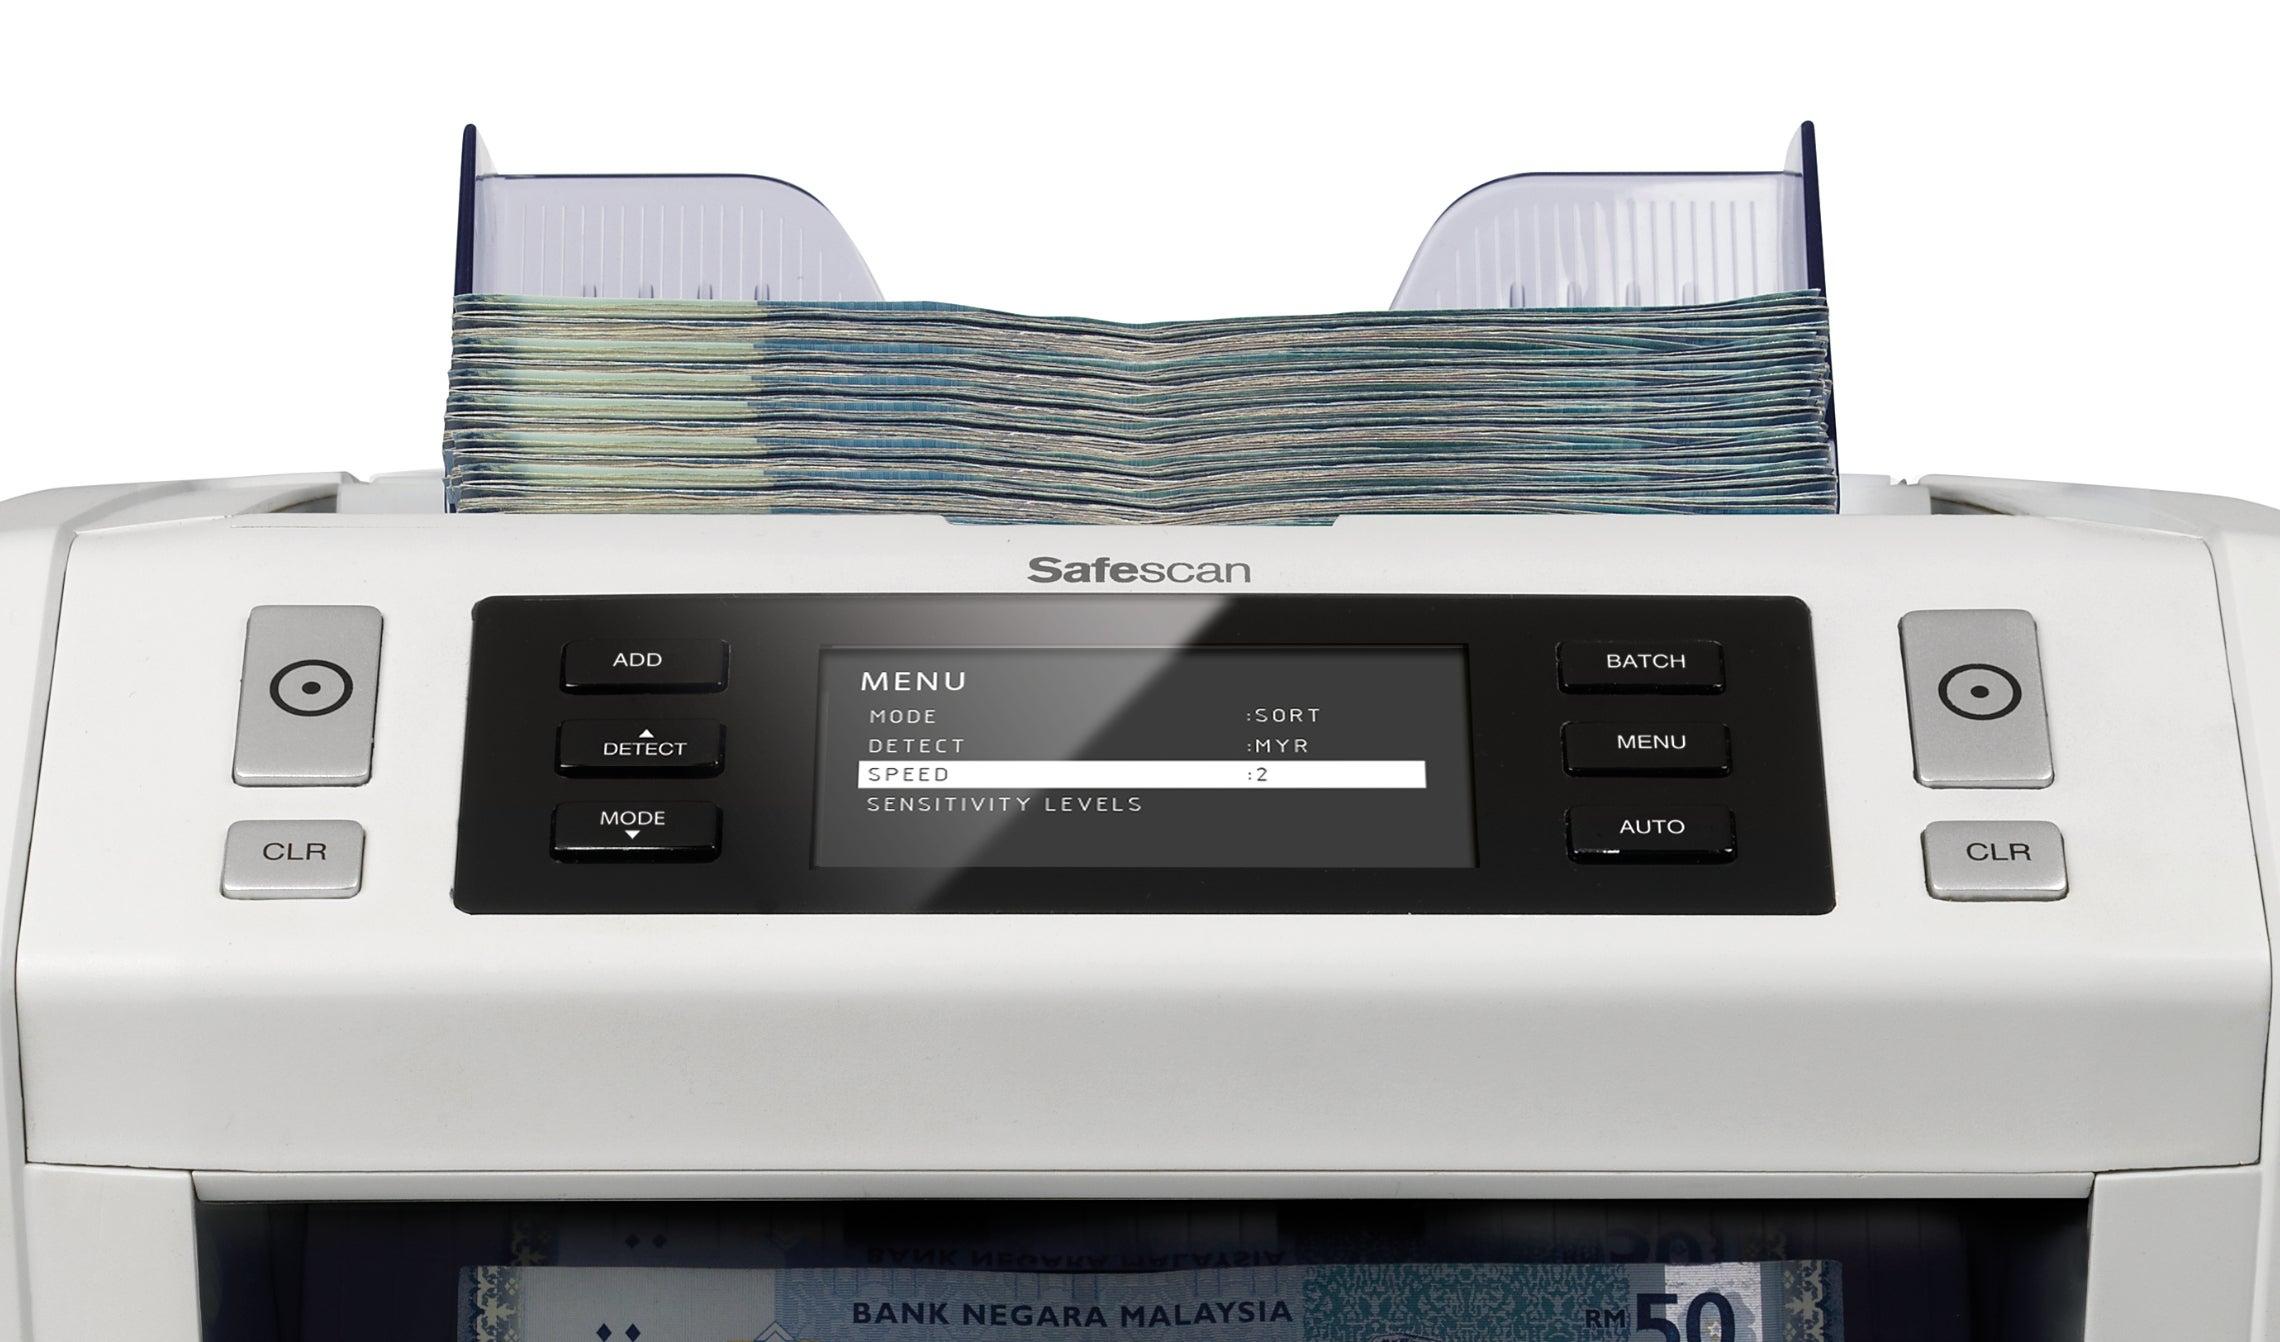 safescan-2610-banknote-counter